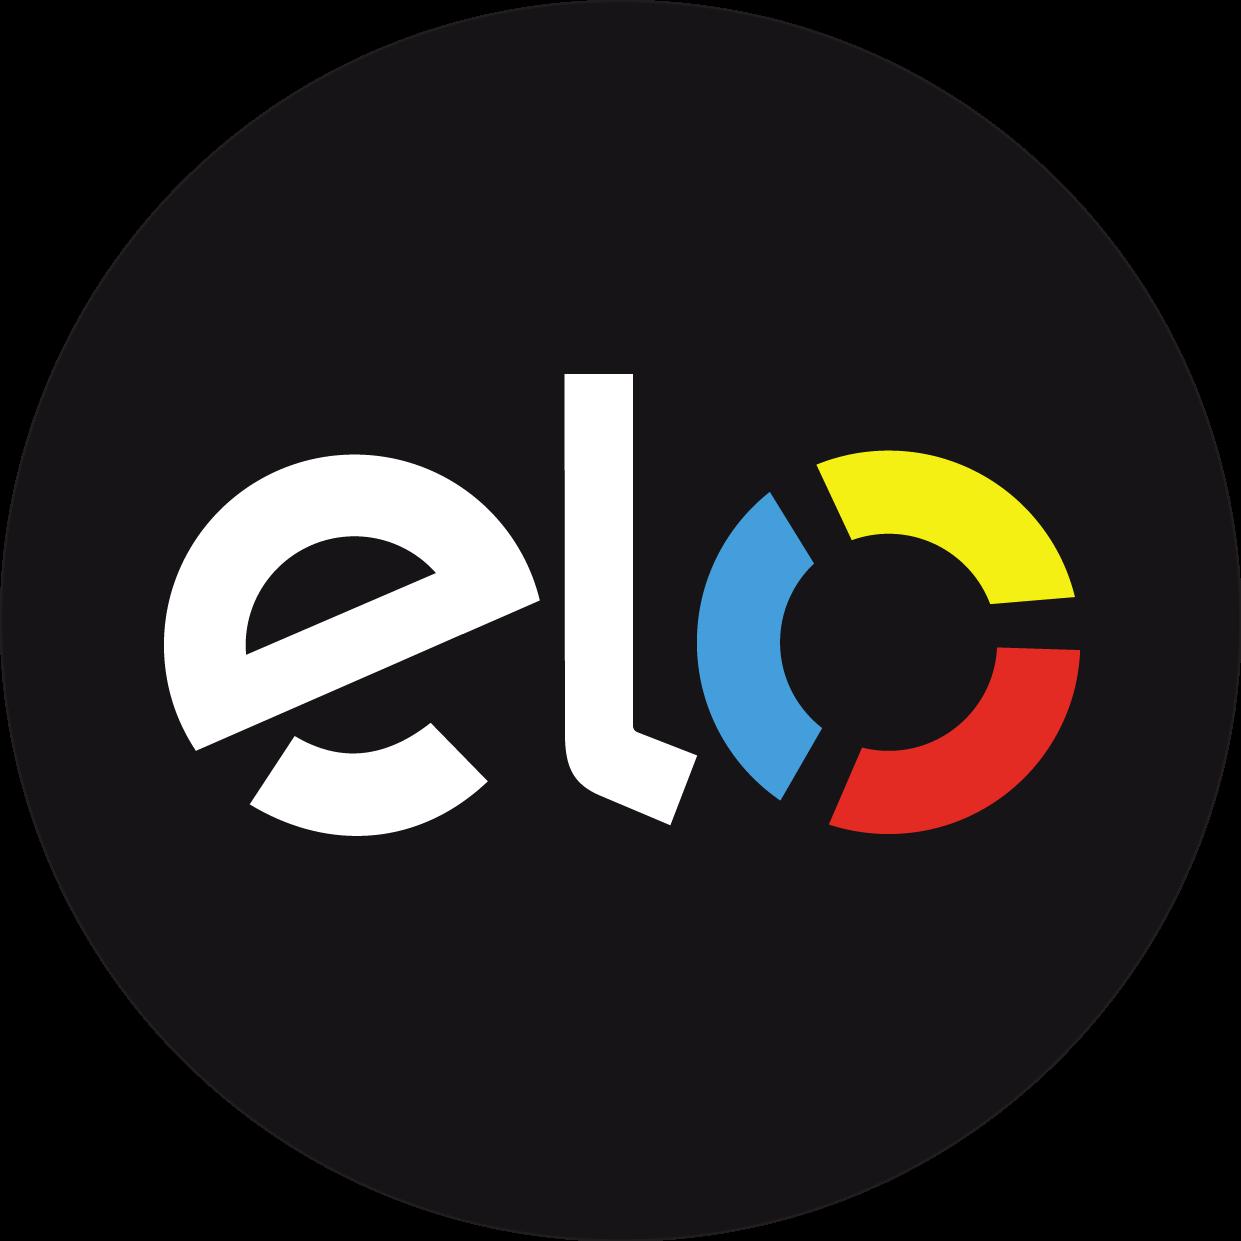 Elo Logo png